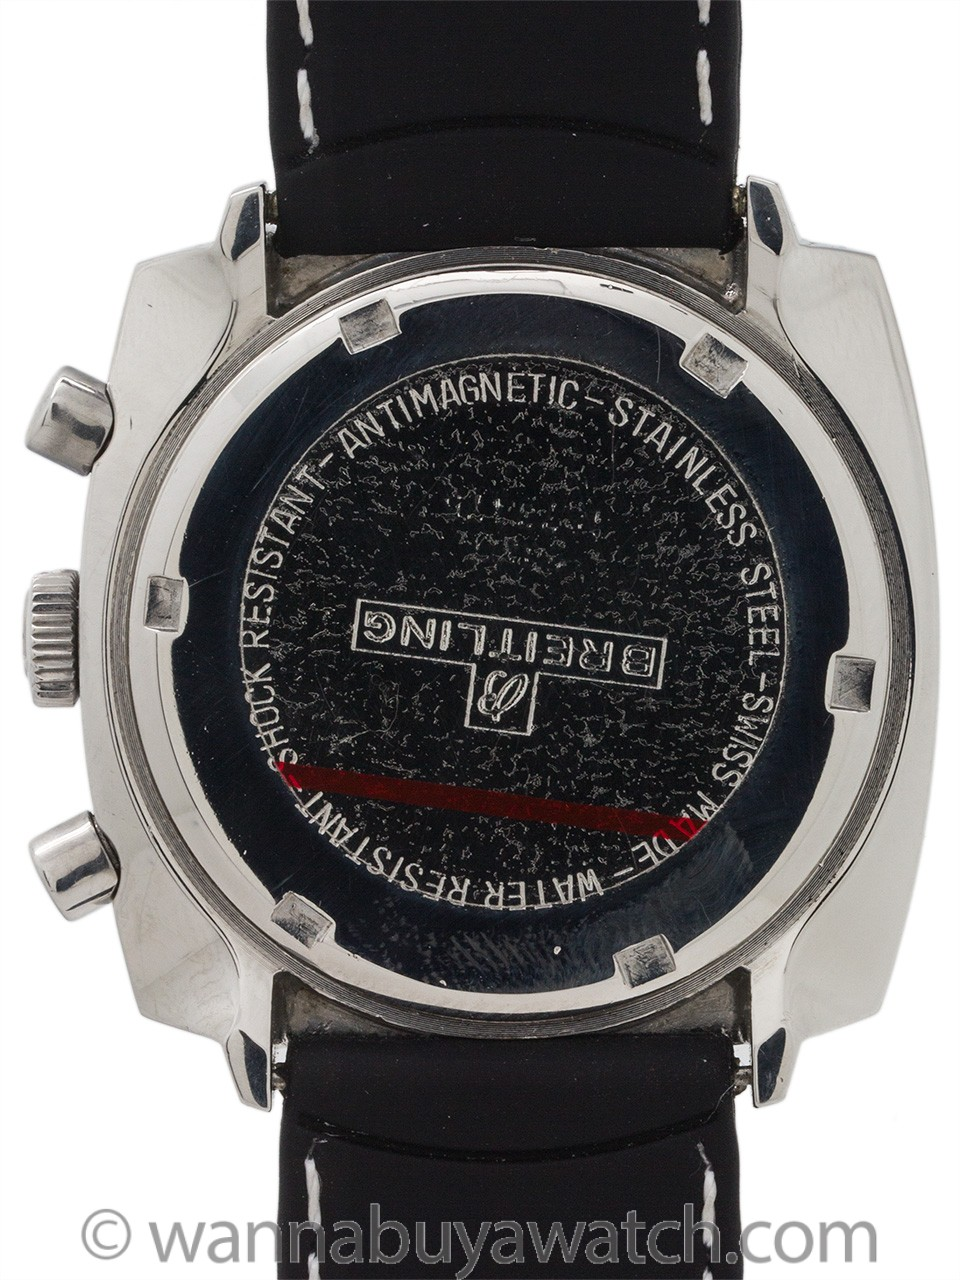 Breitling Sporting Chronograph ref 2030 circa 1970